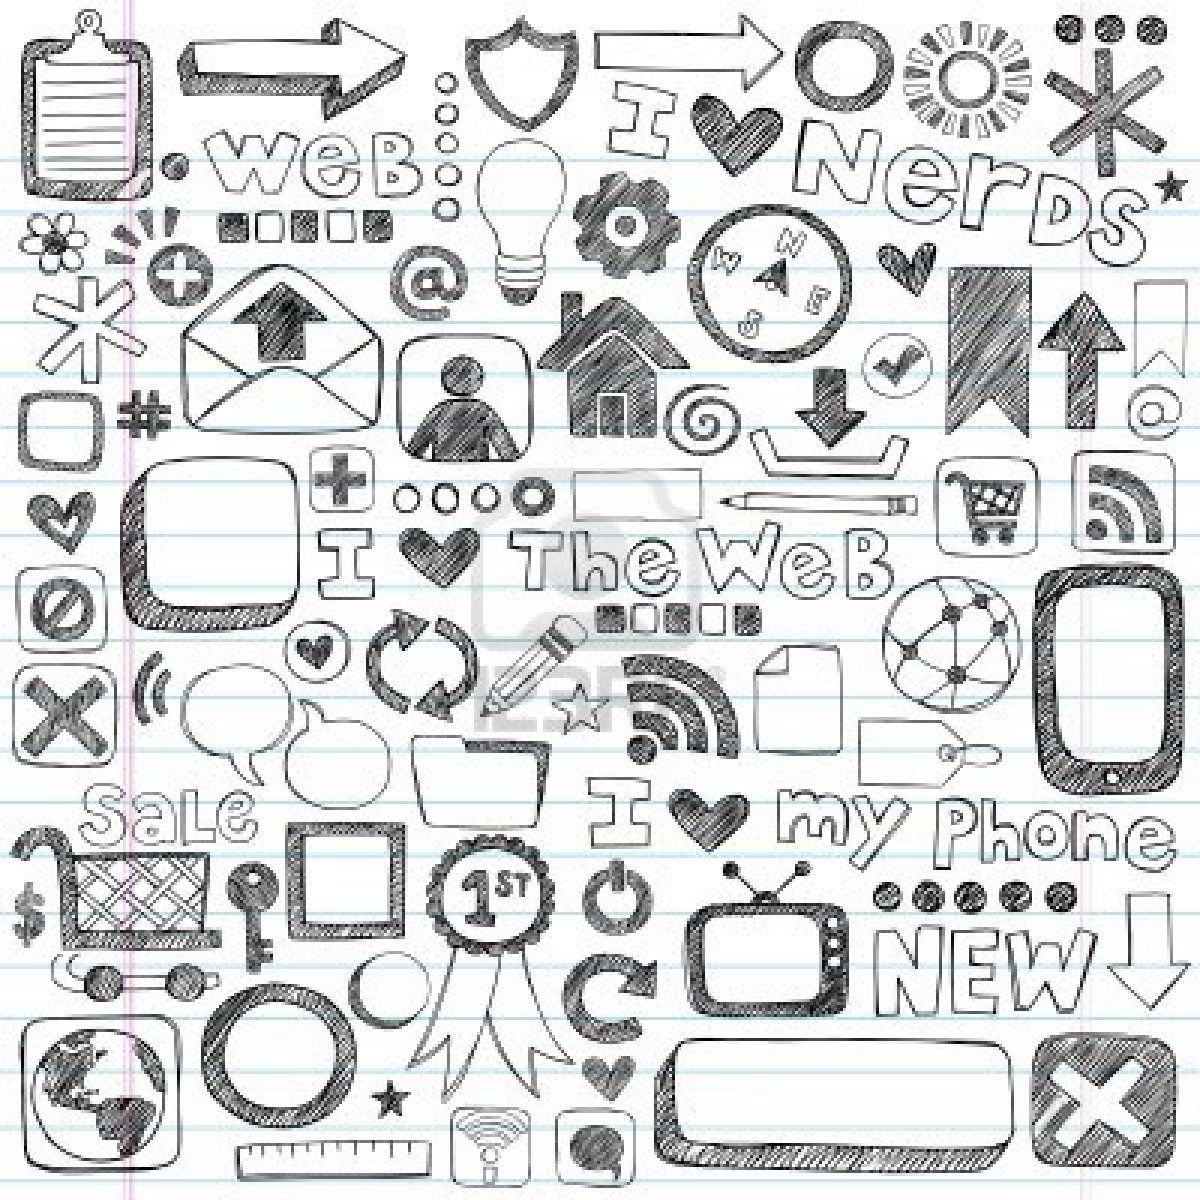 Stock Vector   Doodle icon, Notebook doodles, Doodles